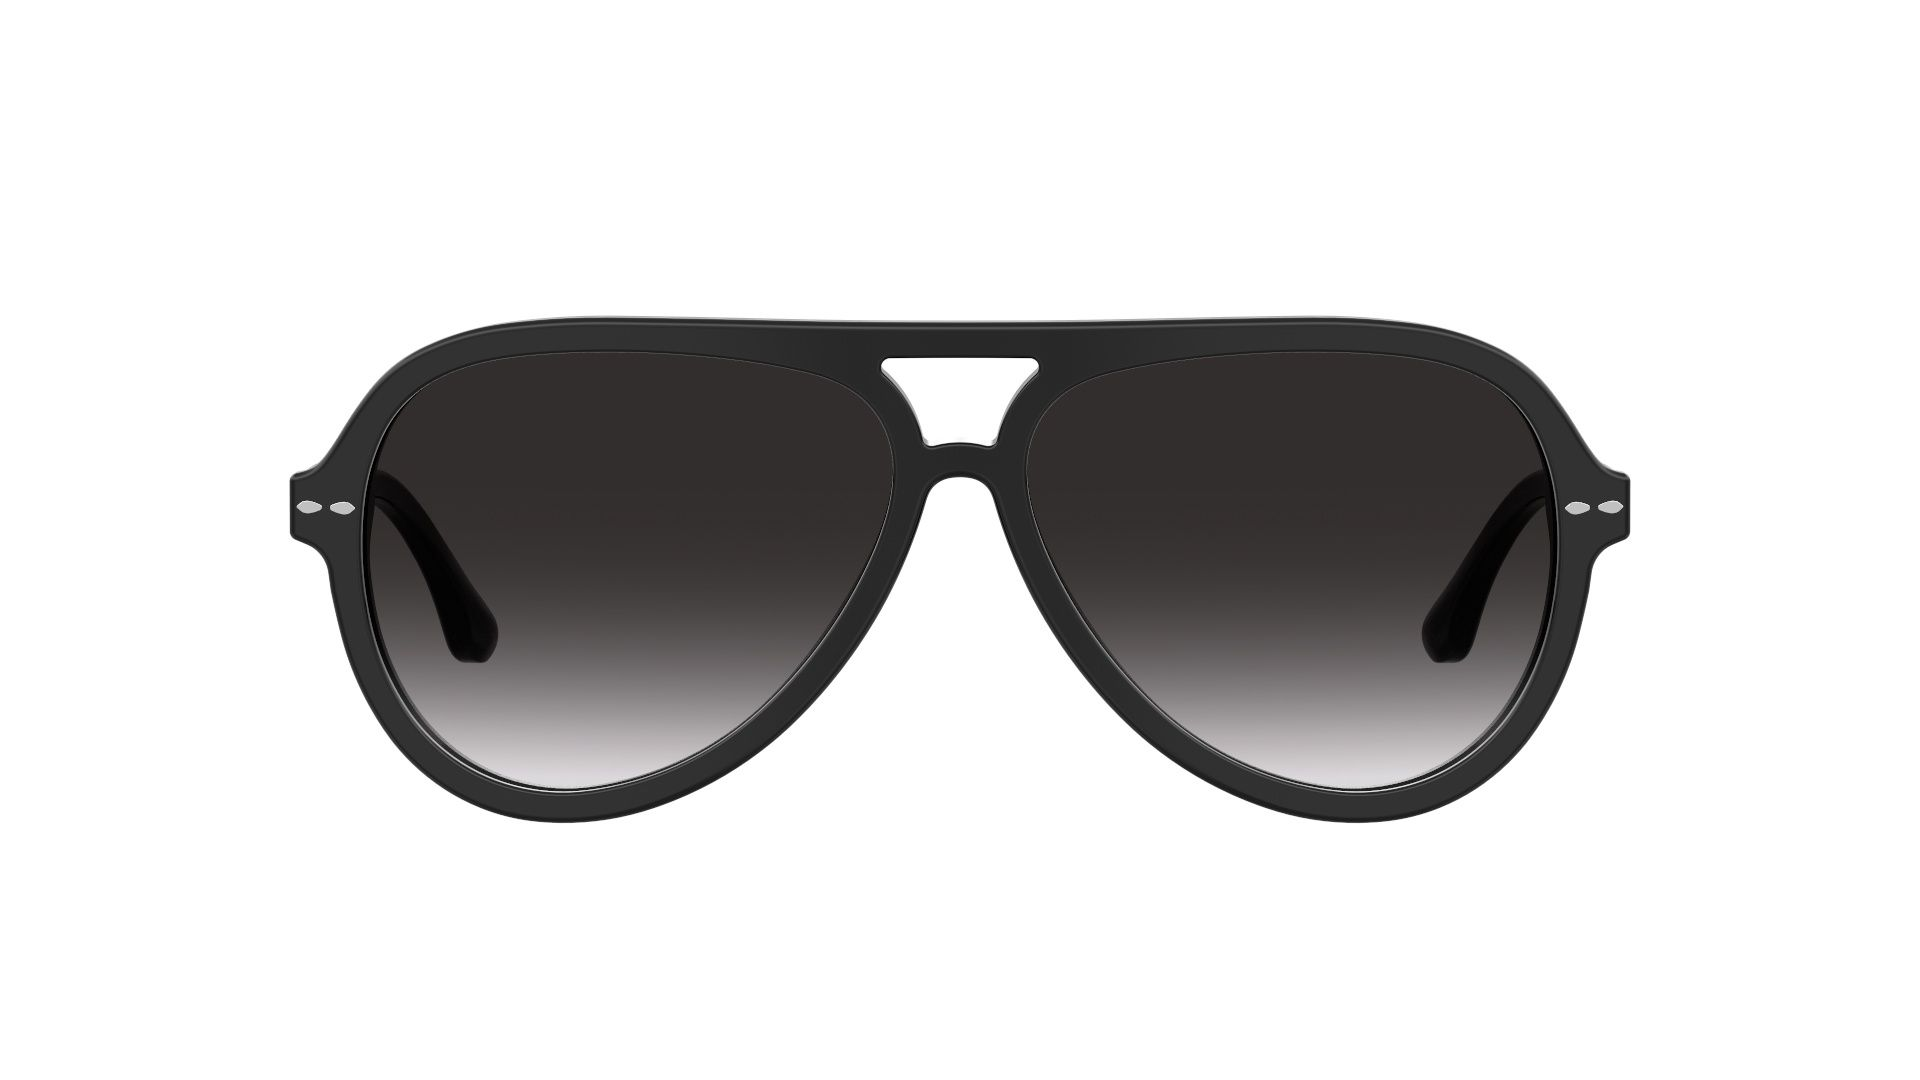 Sonnenbrille, Isabel Marant, Naya, Sunglasses, Aviator, Summer 2021